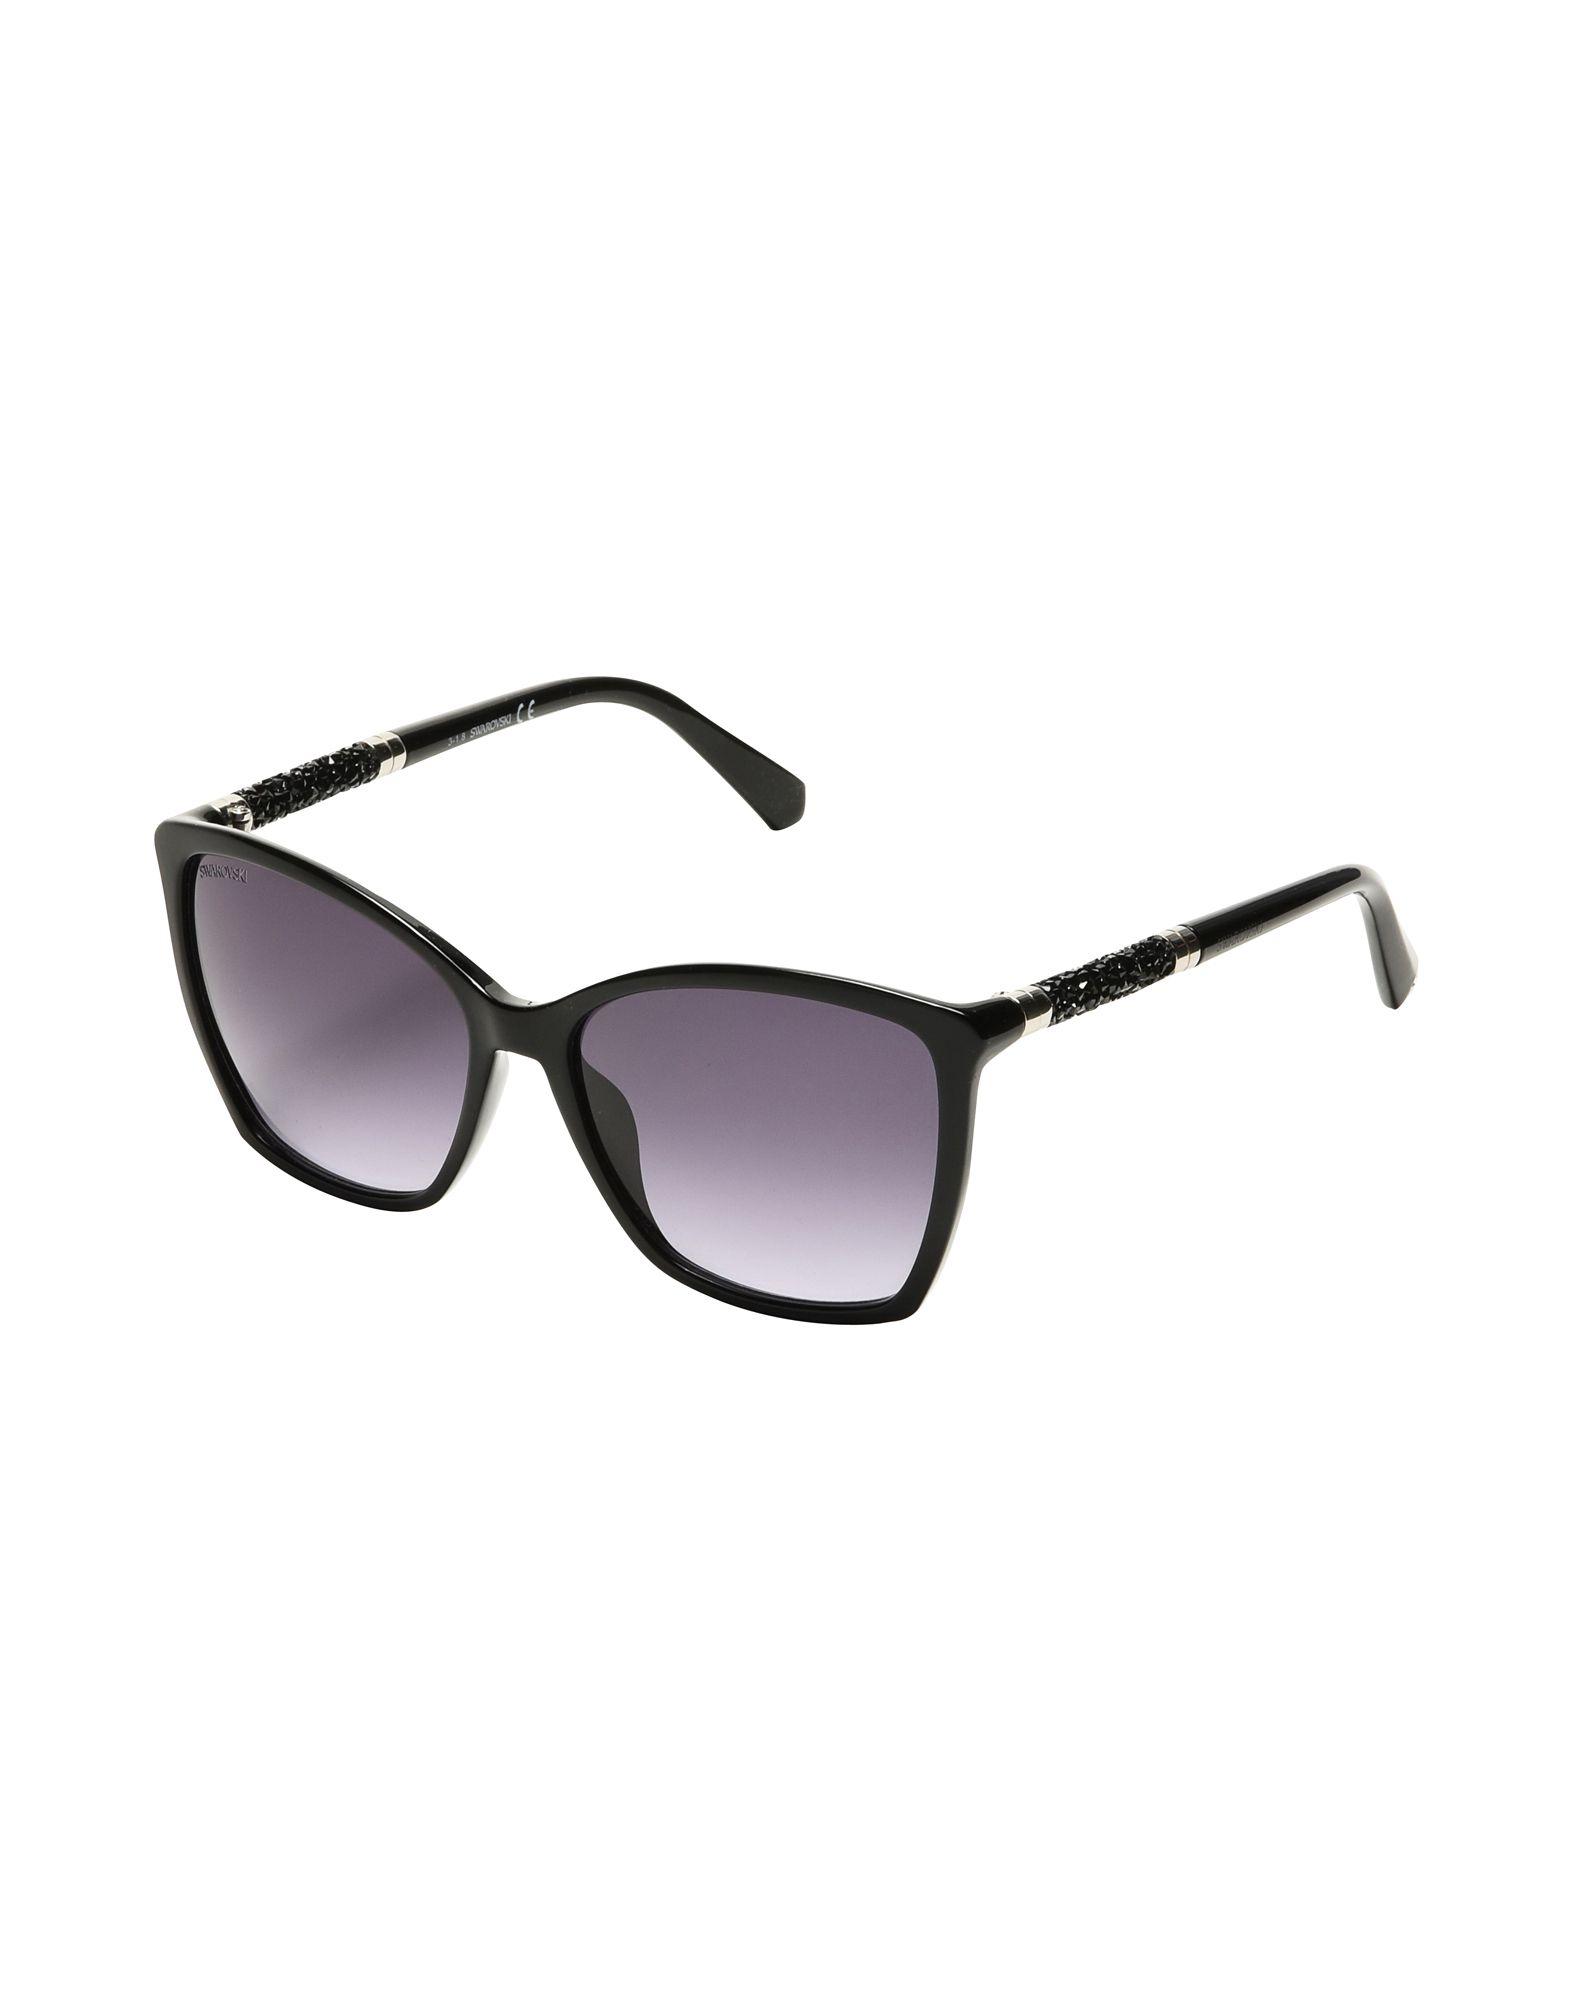 SWAROVSKI Солнечные очки солцезащитные очки